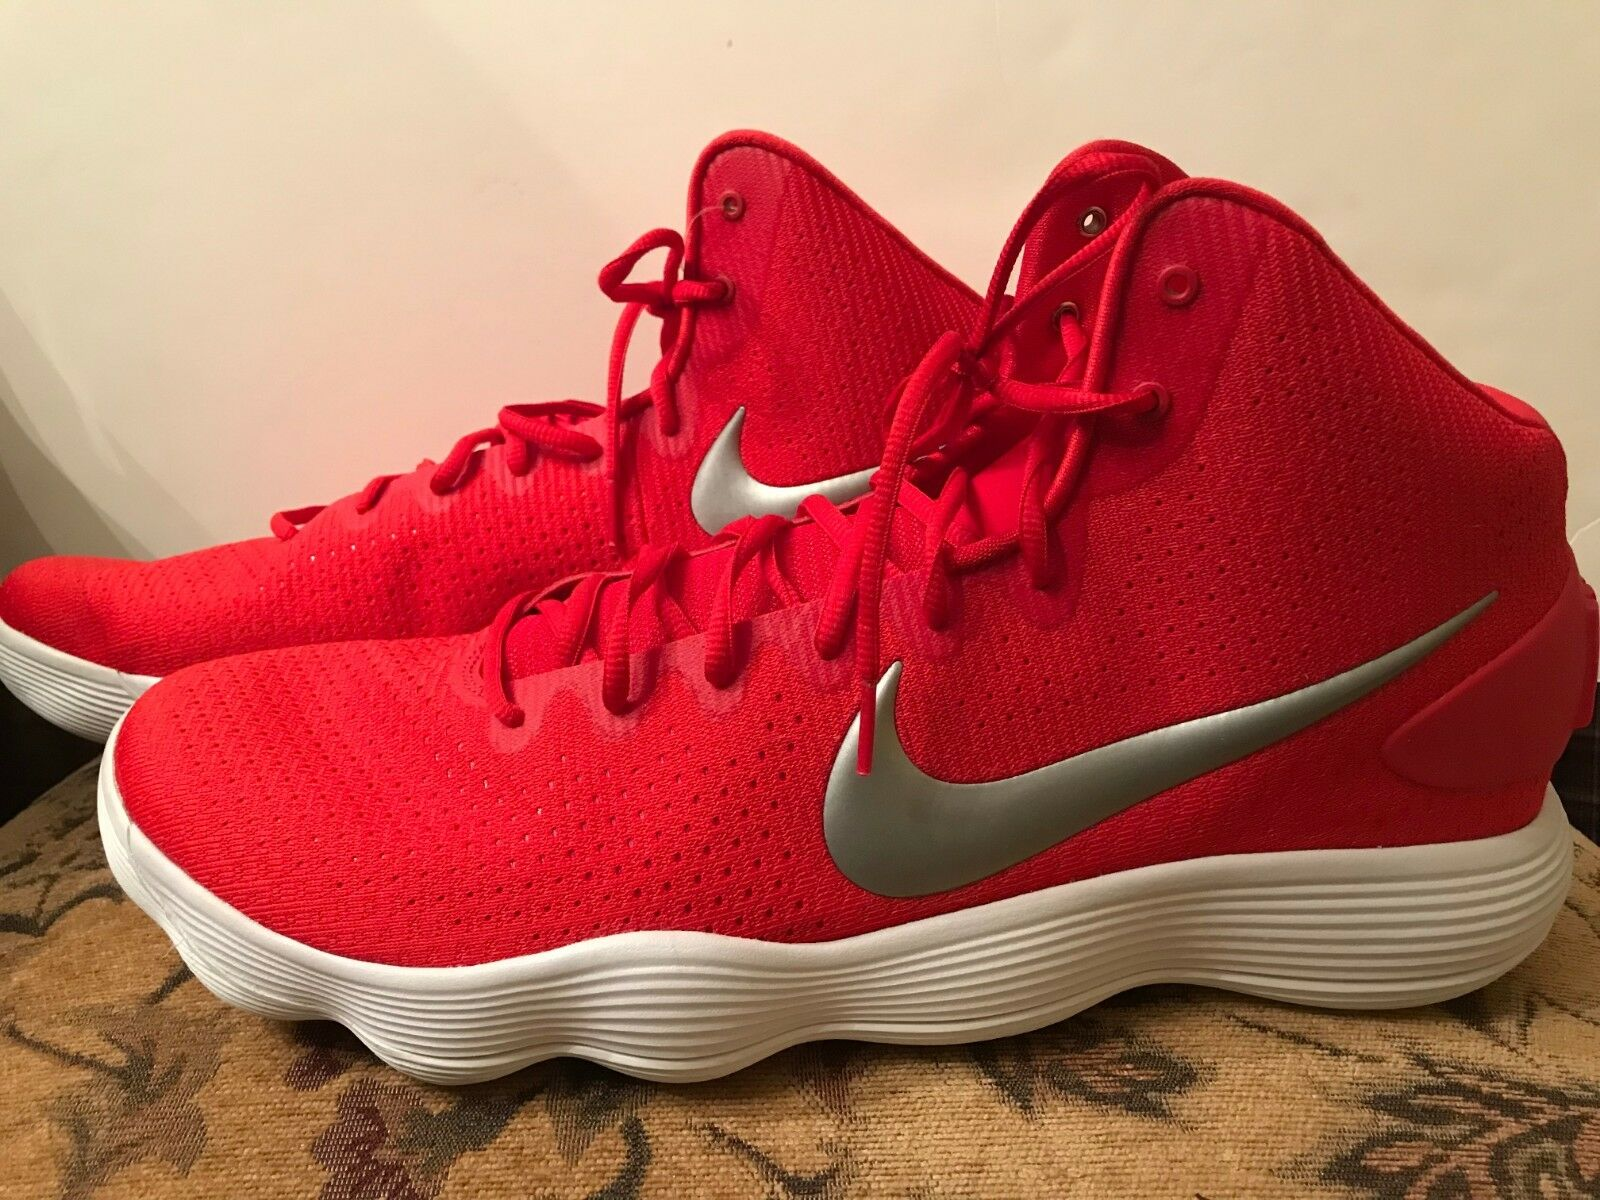 84bf1f1ddf82 New w o Tags Nike React Hyperdunk Hyperdunk Hyperdunk Size 18 Red Sneakers  bd468f